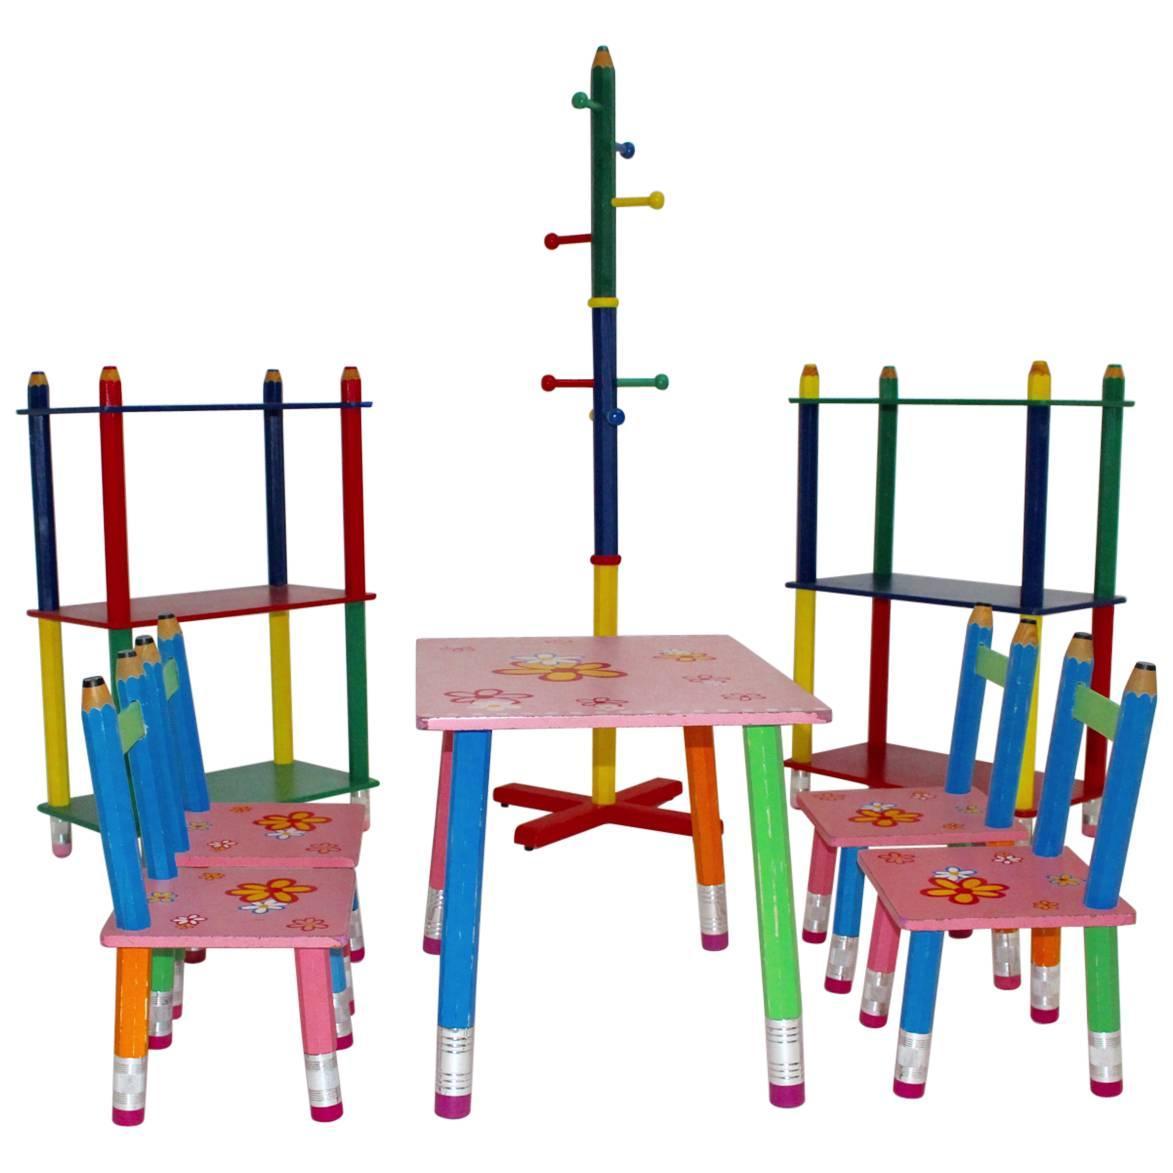 Postmodern Vintage Multicolored Sitting Set by Pierre Sala 1980s France